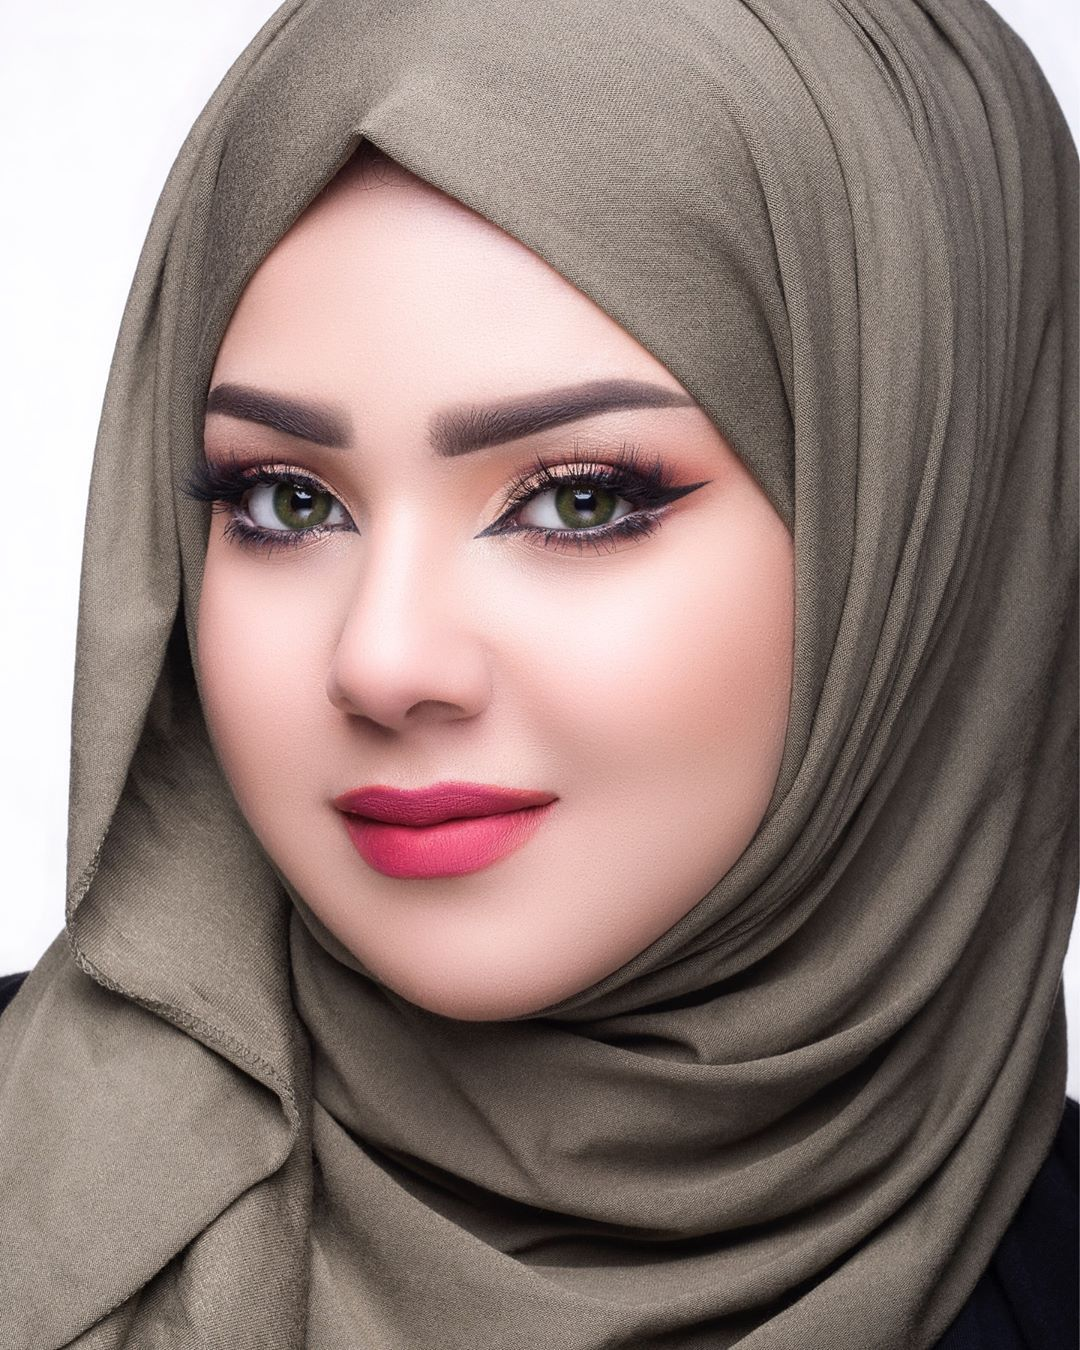 Gambar Mungkin Berisi 1 Orang Dekat Beautiful Muslim Women